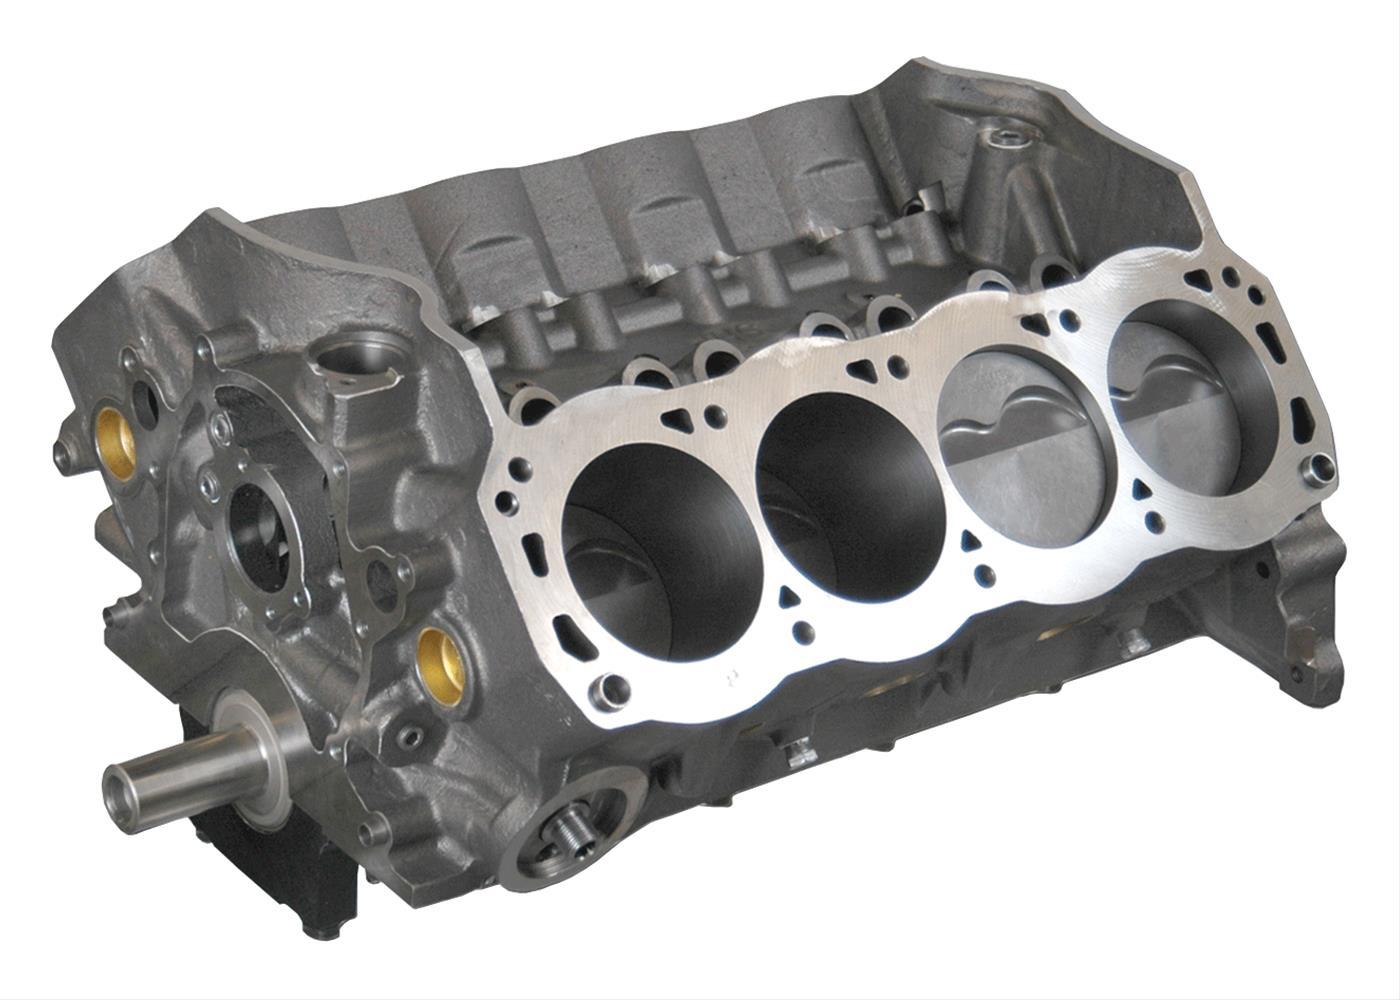 Dart Small Block Ford 427 C I D  Short Block Engines 03224272